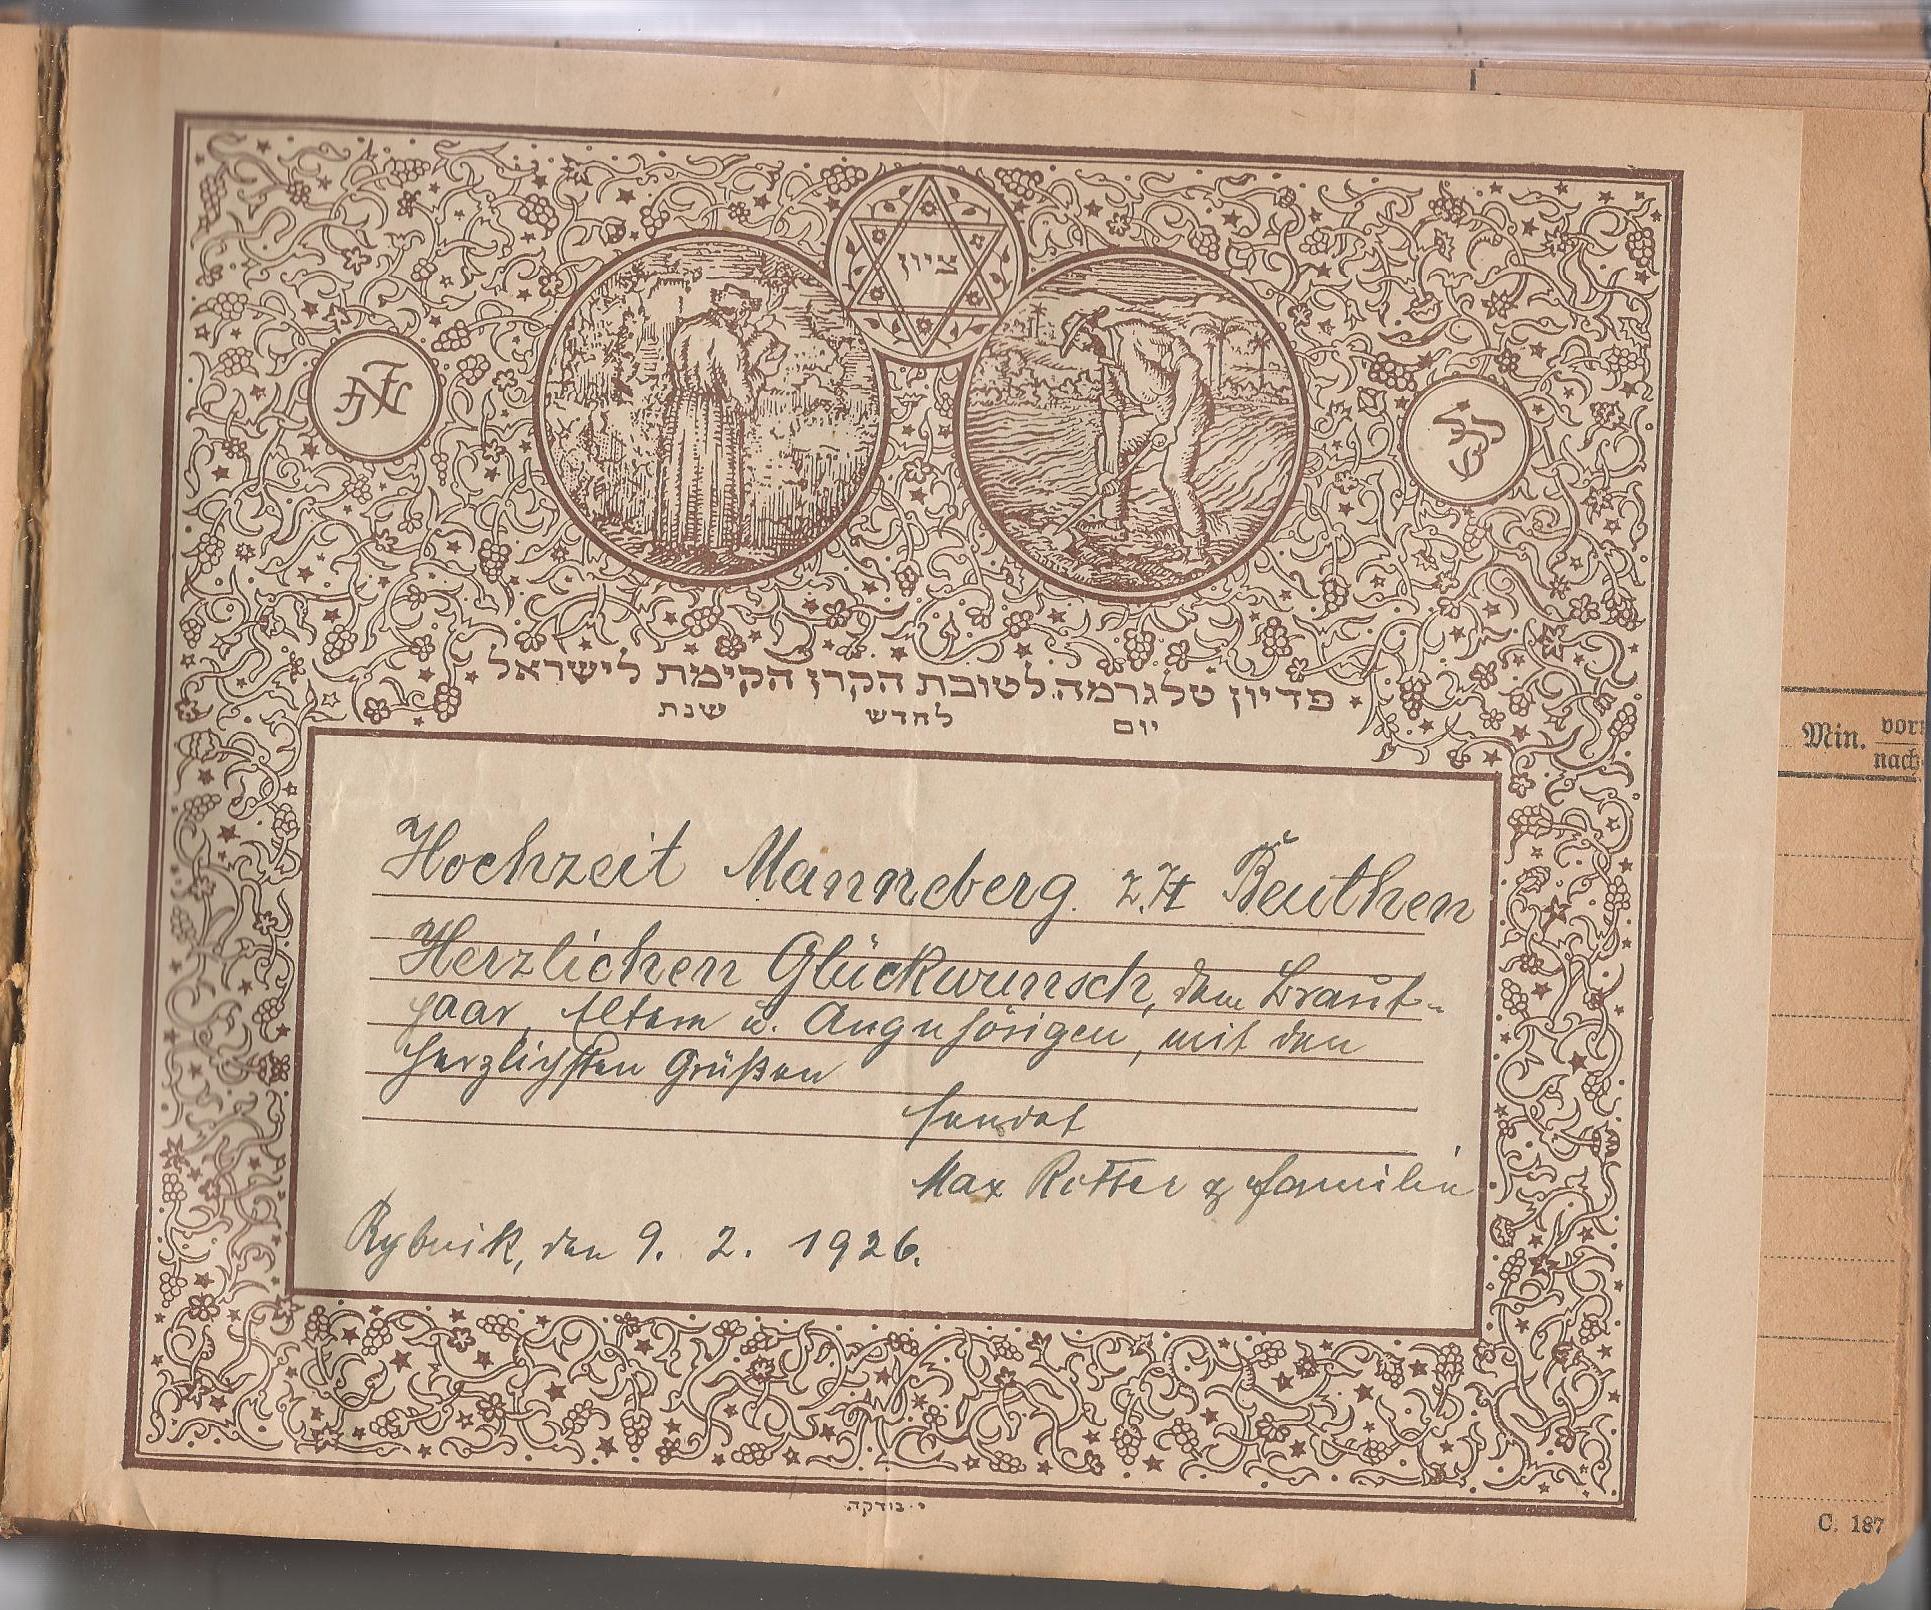 Guttmann wedding telegram-5